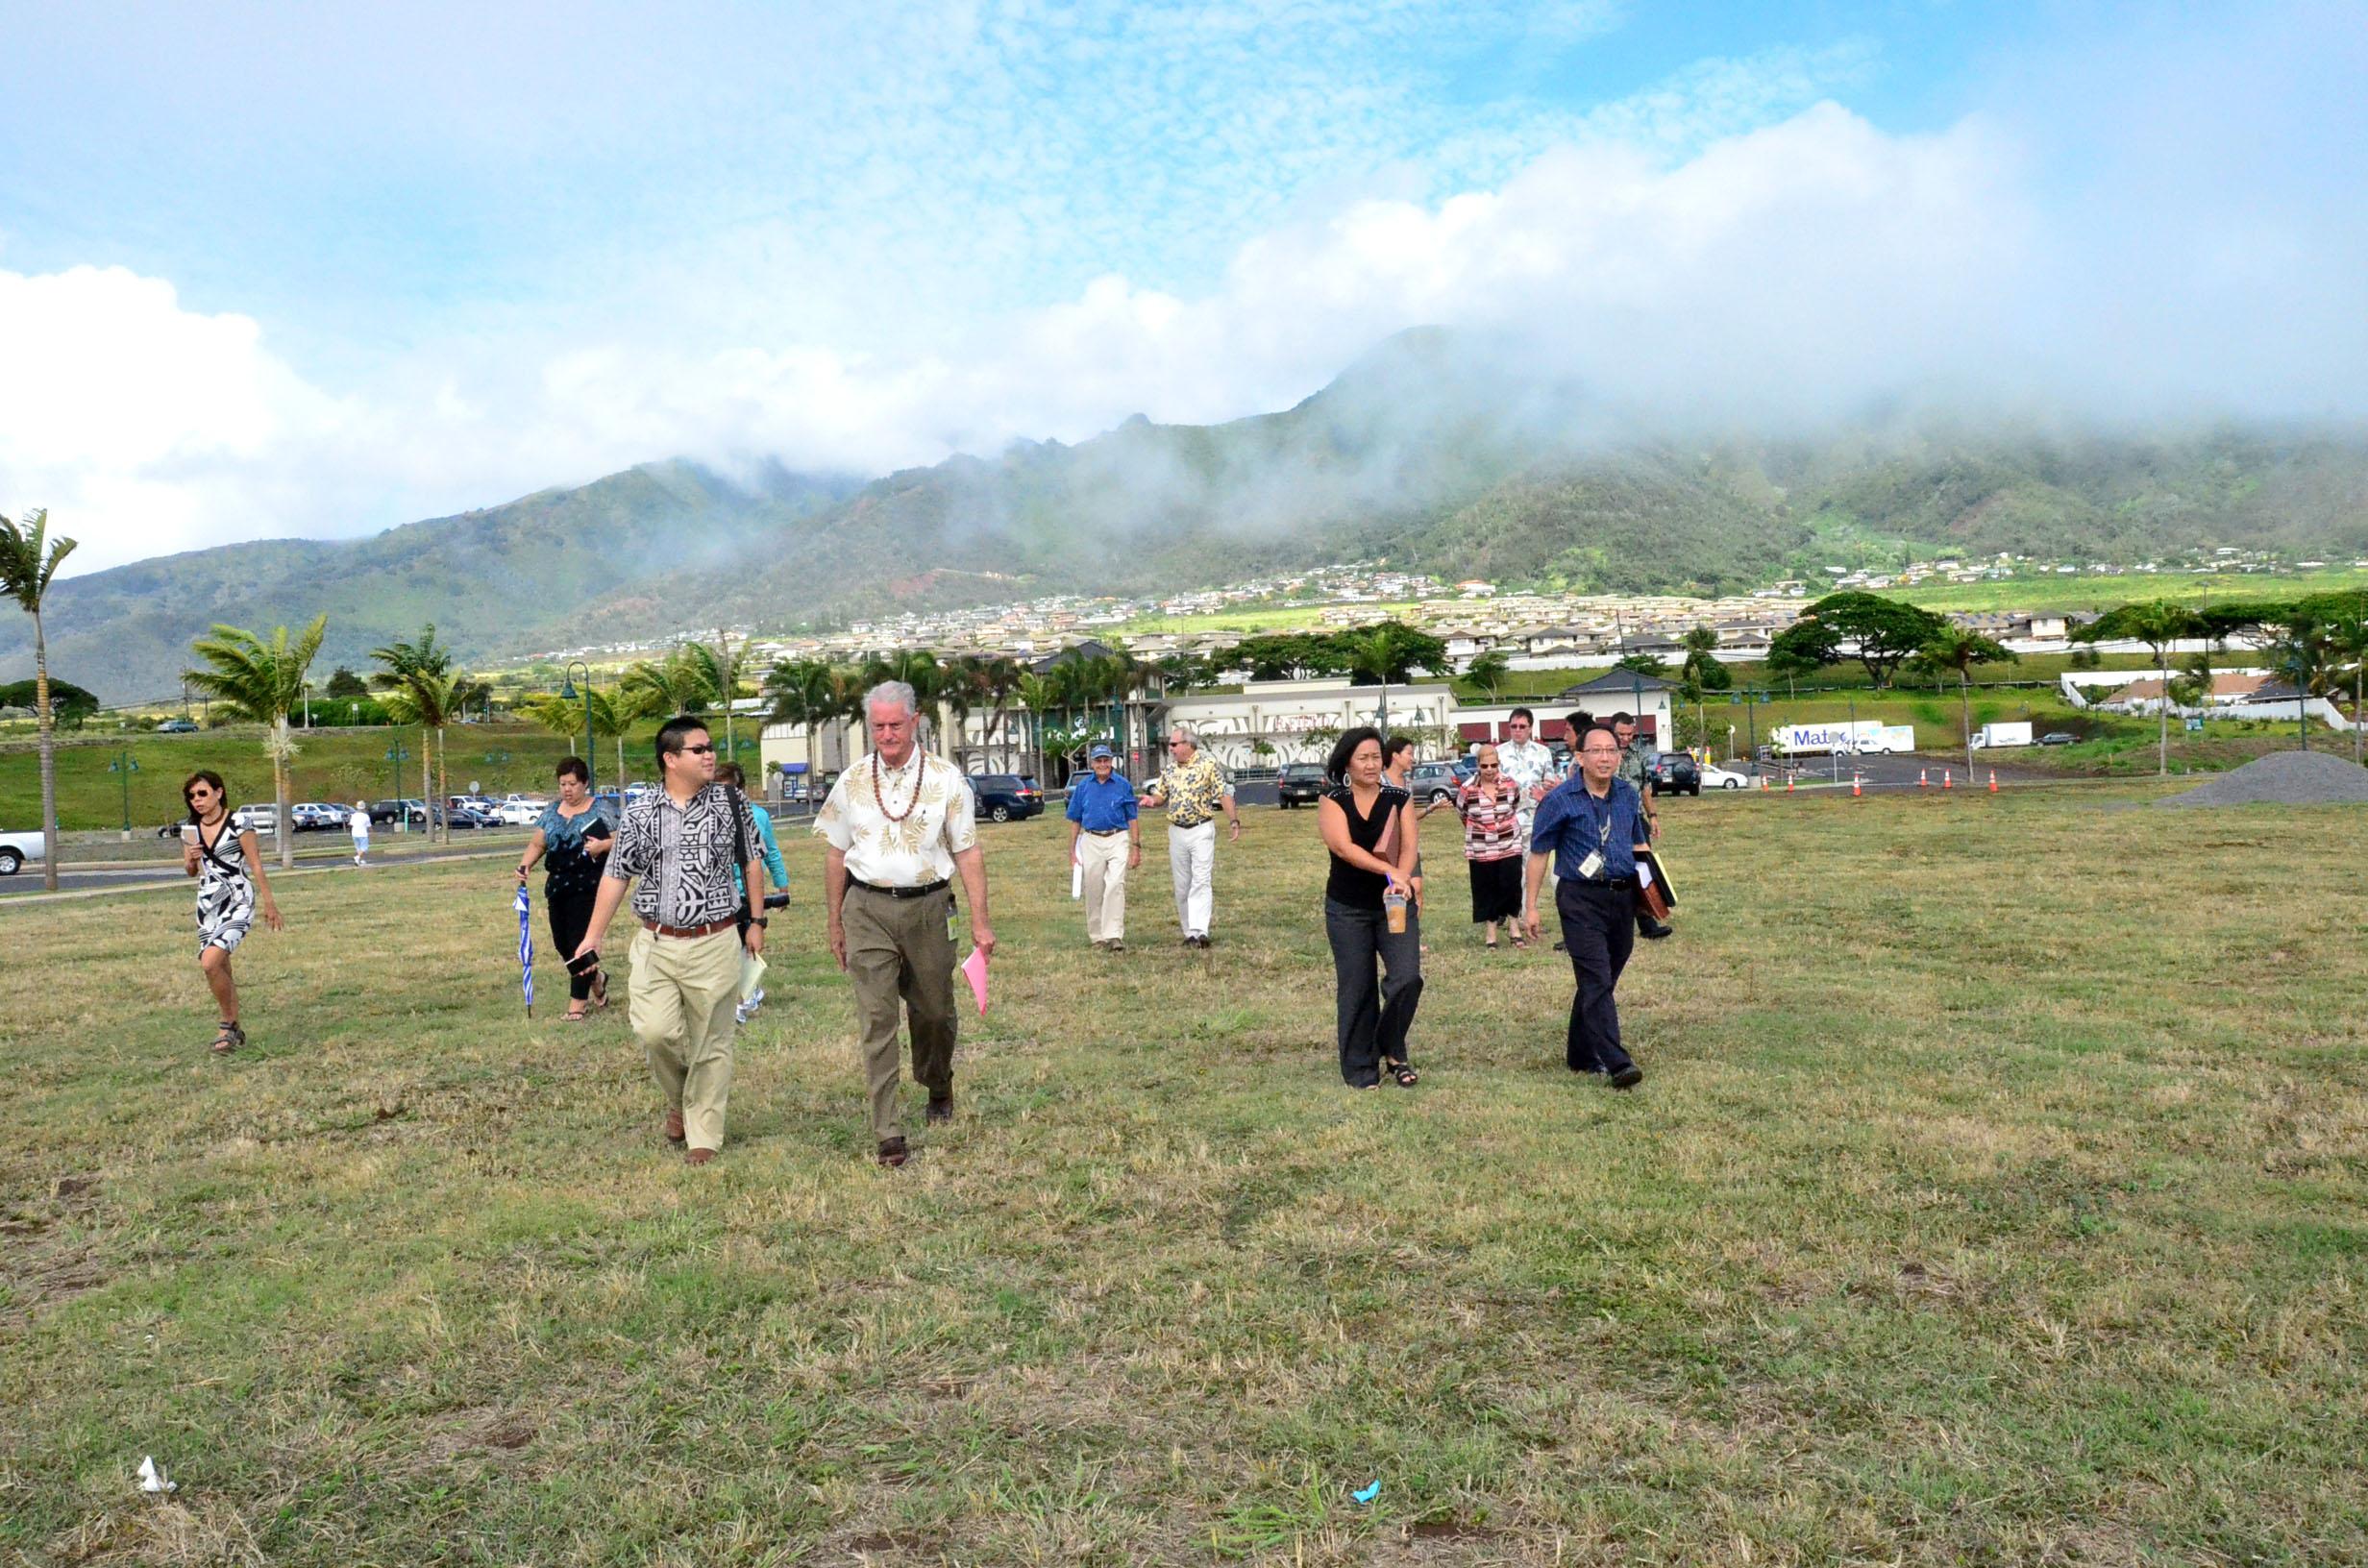 Kehalani site - new county service center